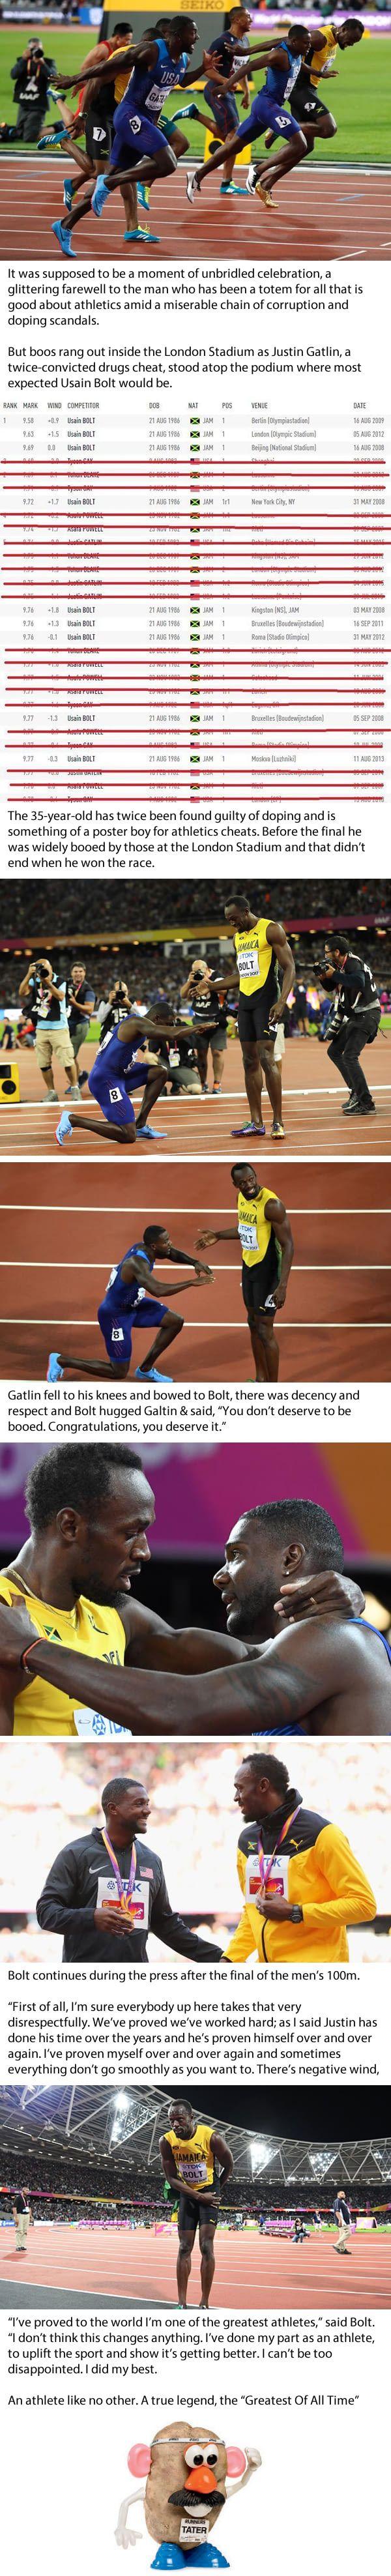 Usain Bolt Insists Justin Gatlin Did Not Deserve Boos But Deserved The 100m World Title